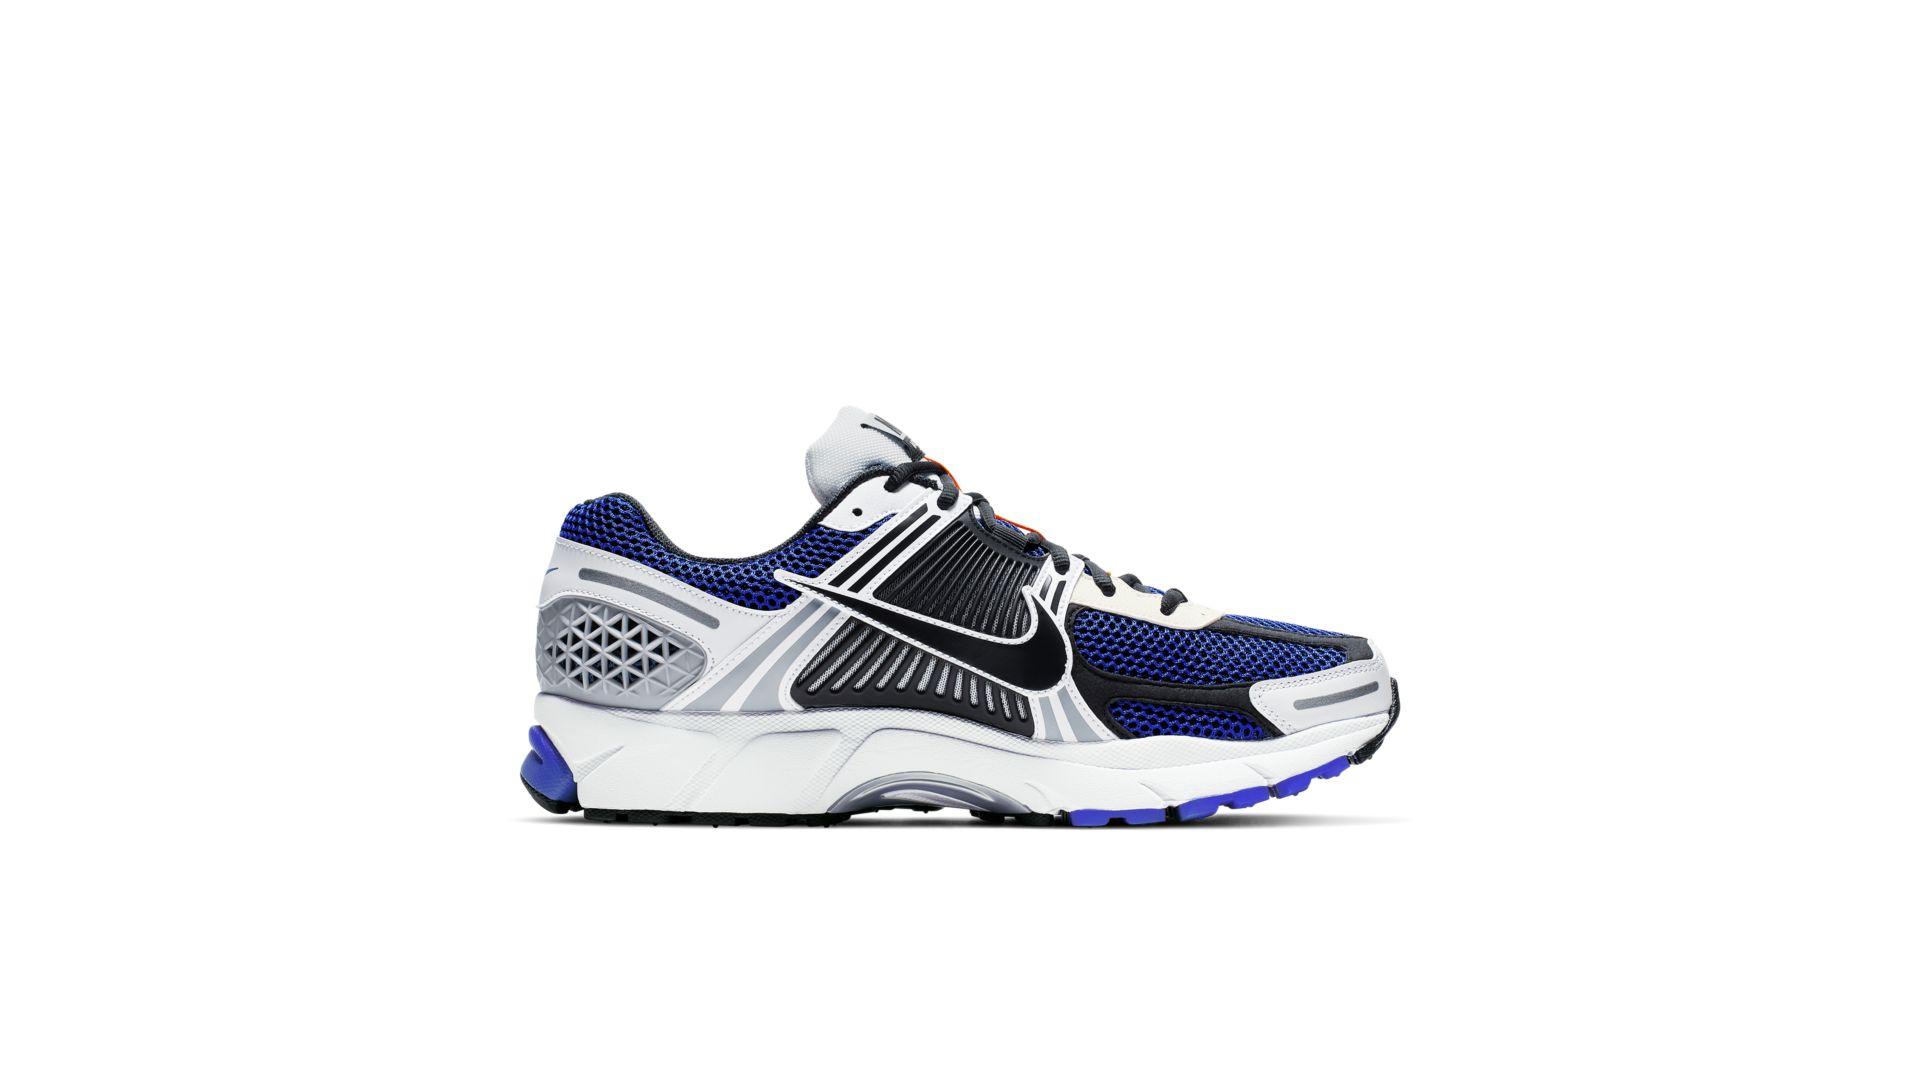 Nike Zoom Vomero 5 SE SP 'Racer Blue' (CI1694-100)